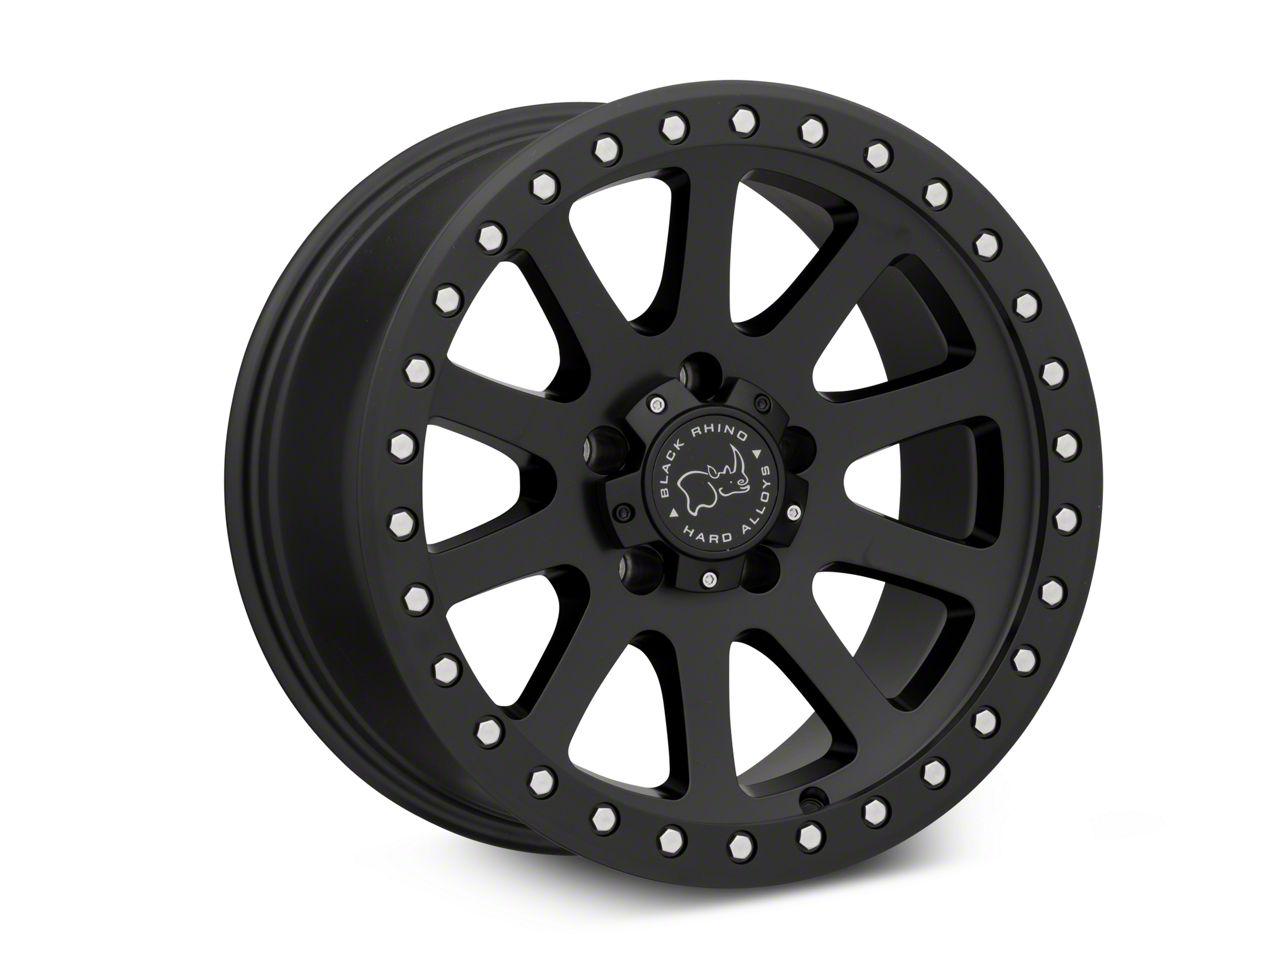 Black Rhino Mint Matte Black Wheels (07-18 Jeep Wrangler JK; 2018 Jeep Wrangler JL)